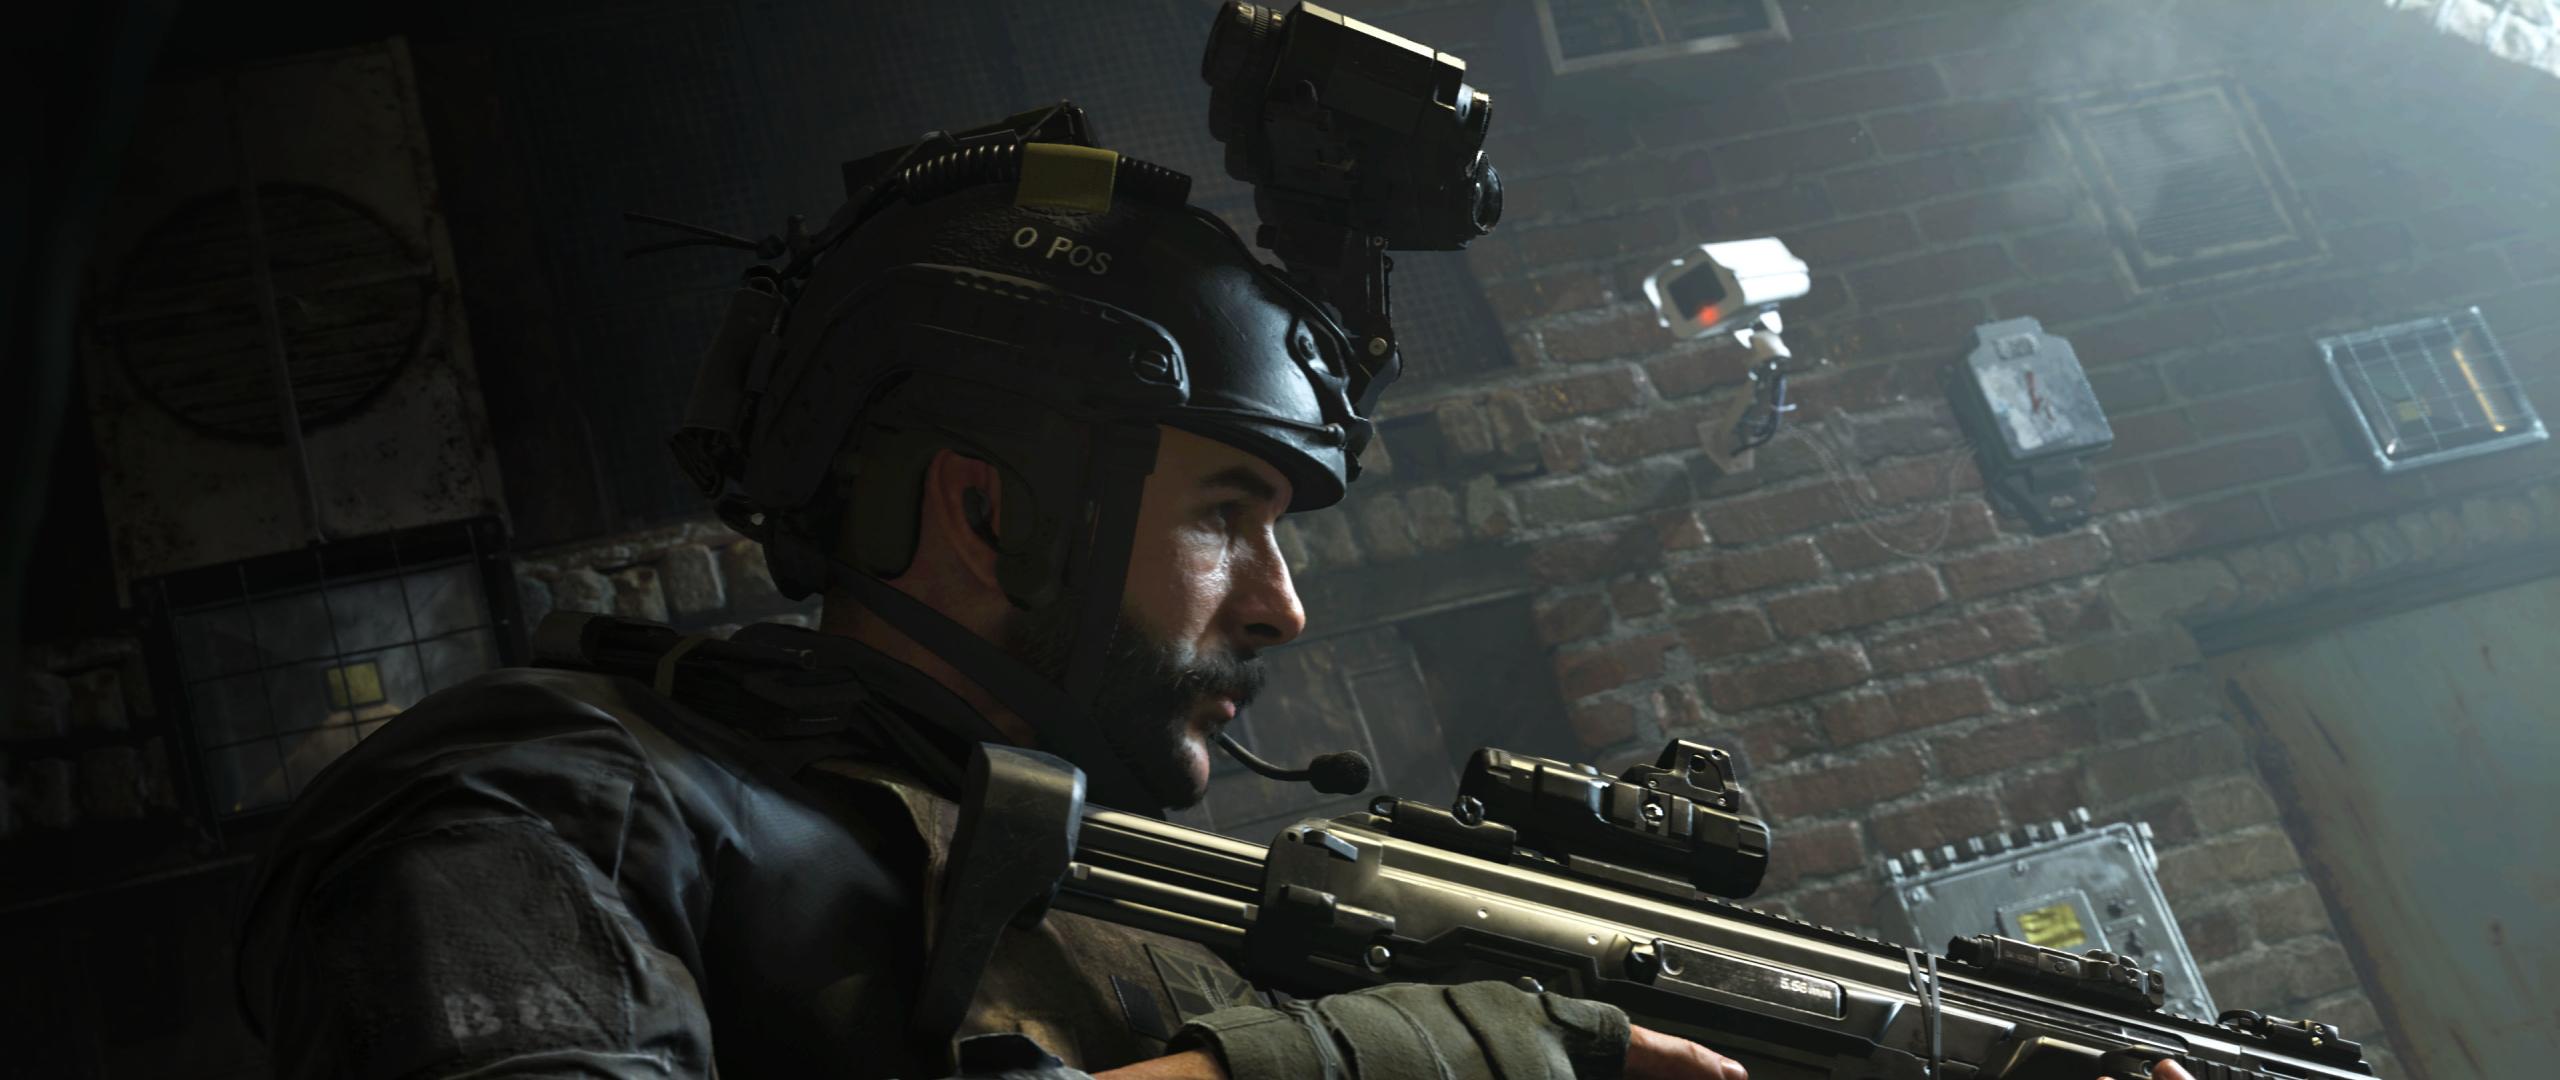 2560x1080 Call Of Duty Modern Warfare Game 2019 2560x1080